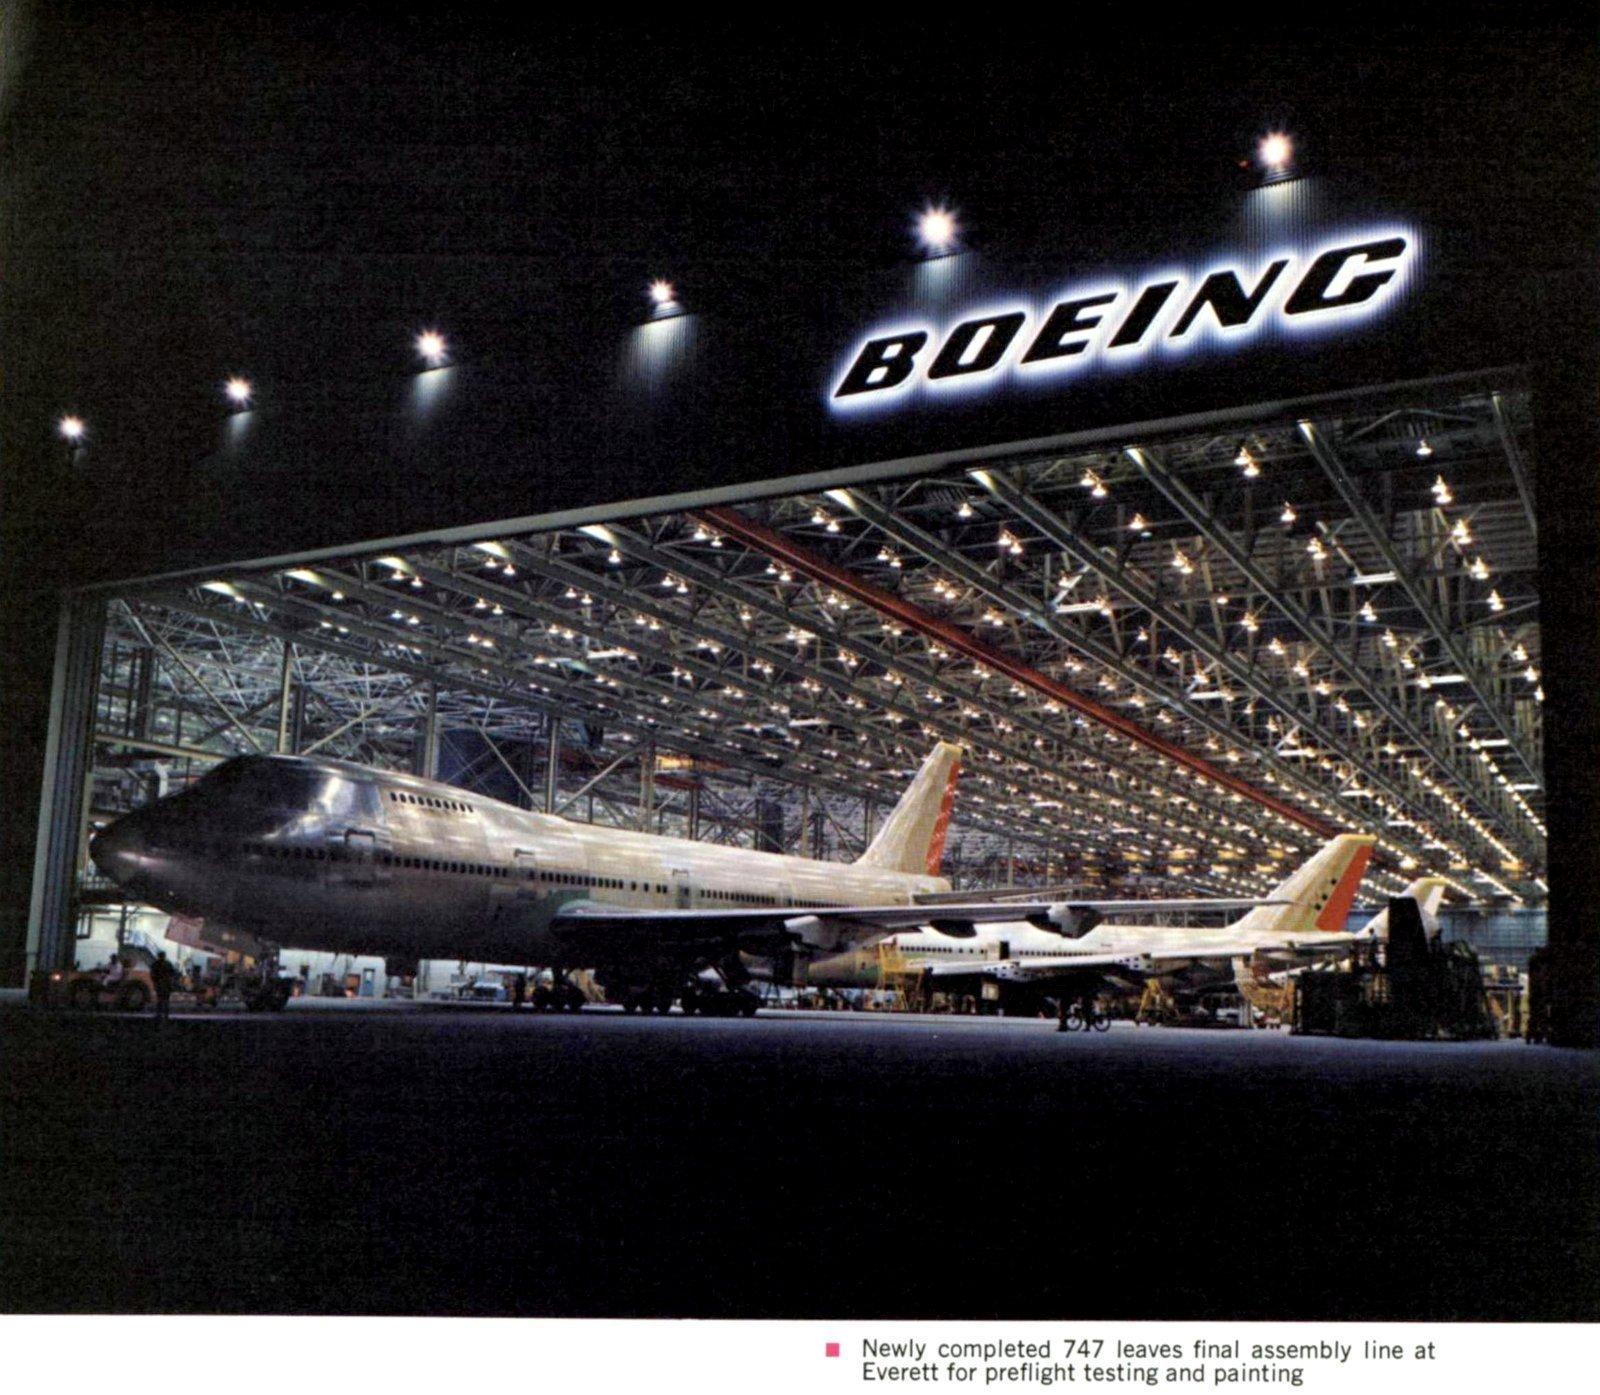 Boeing 747 jumbo jet going for final assembly (1971)